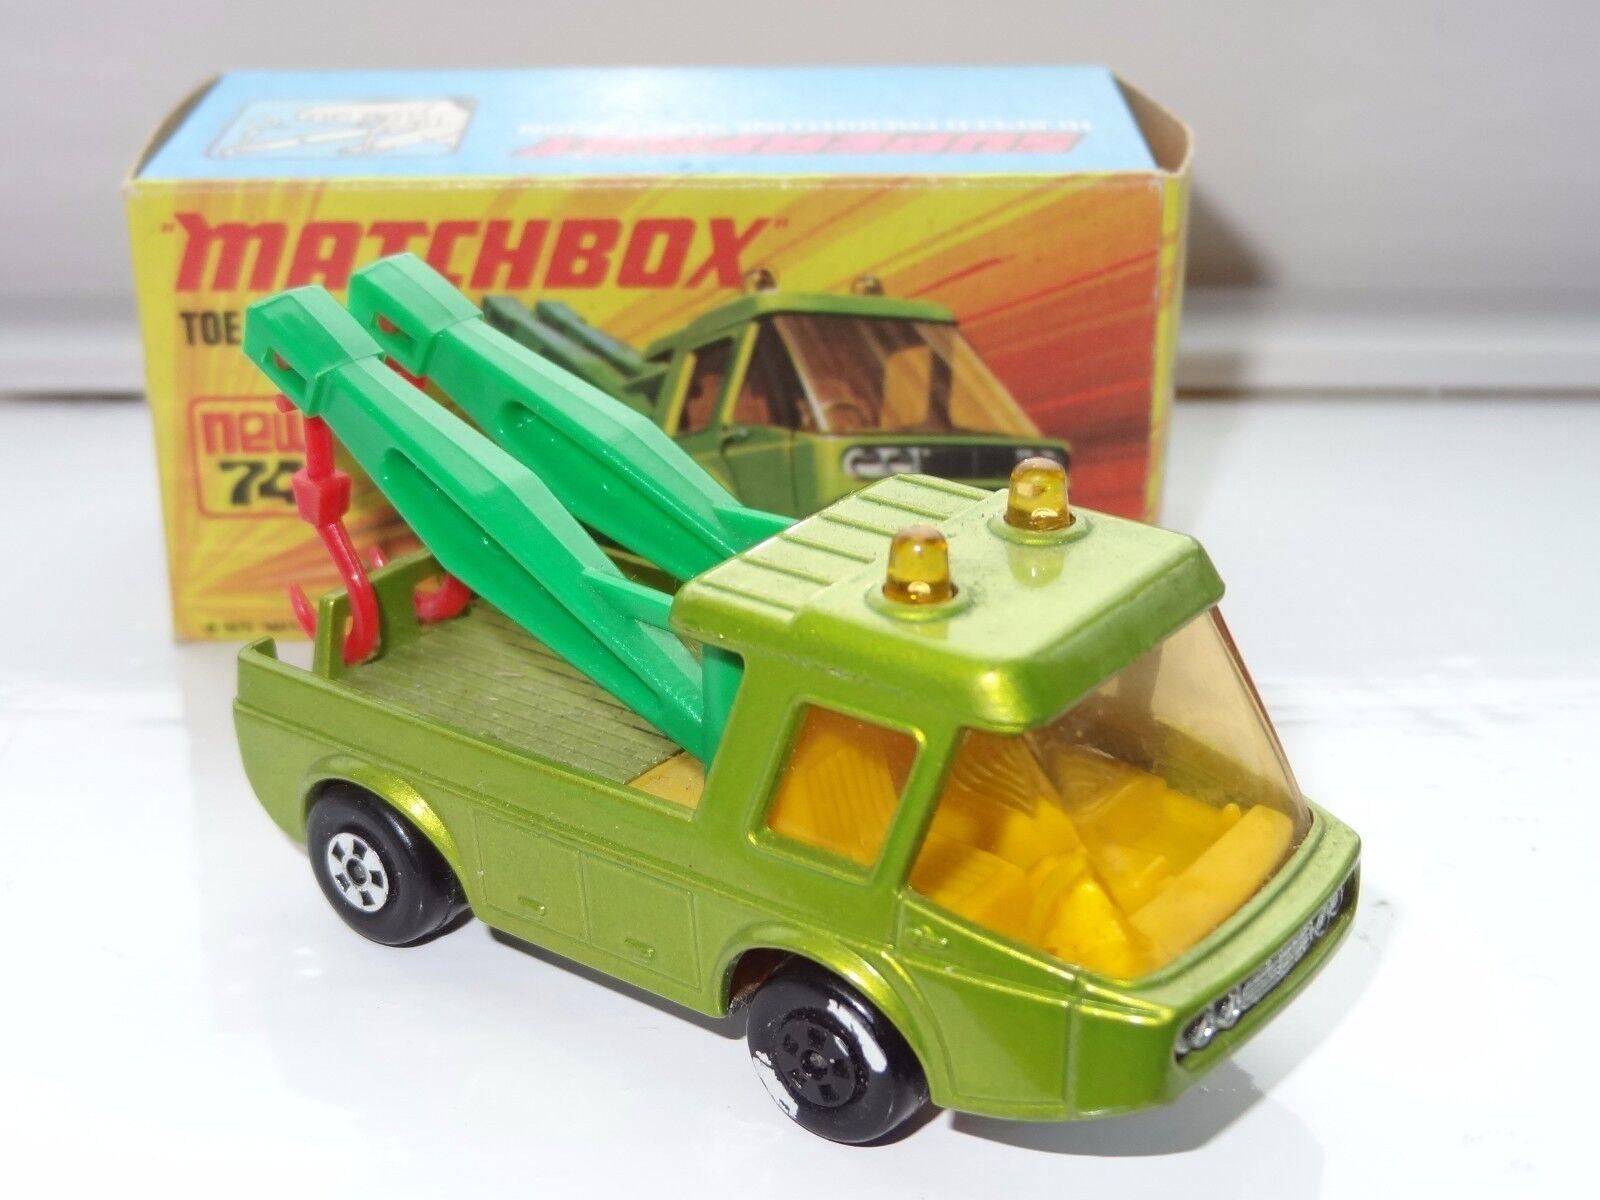 (K) lesney matchbox SUPERFAST TOE JOE BREAKDOWN - 74 factory error